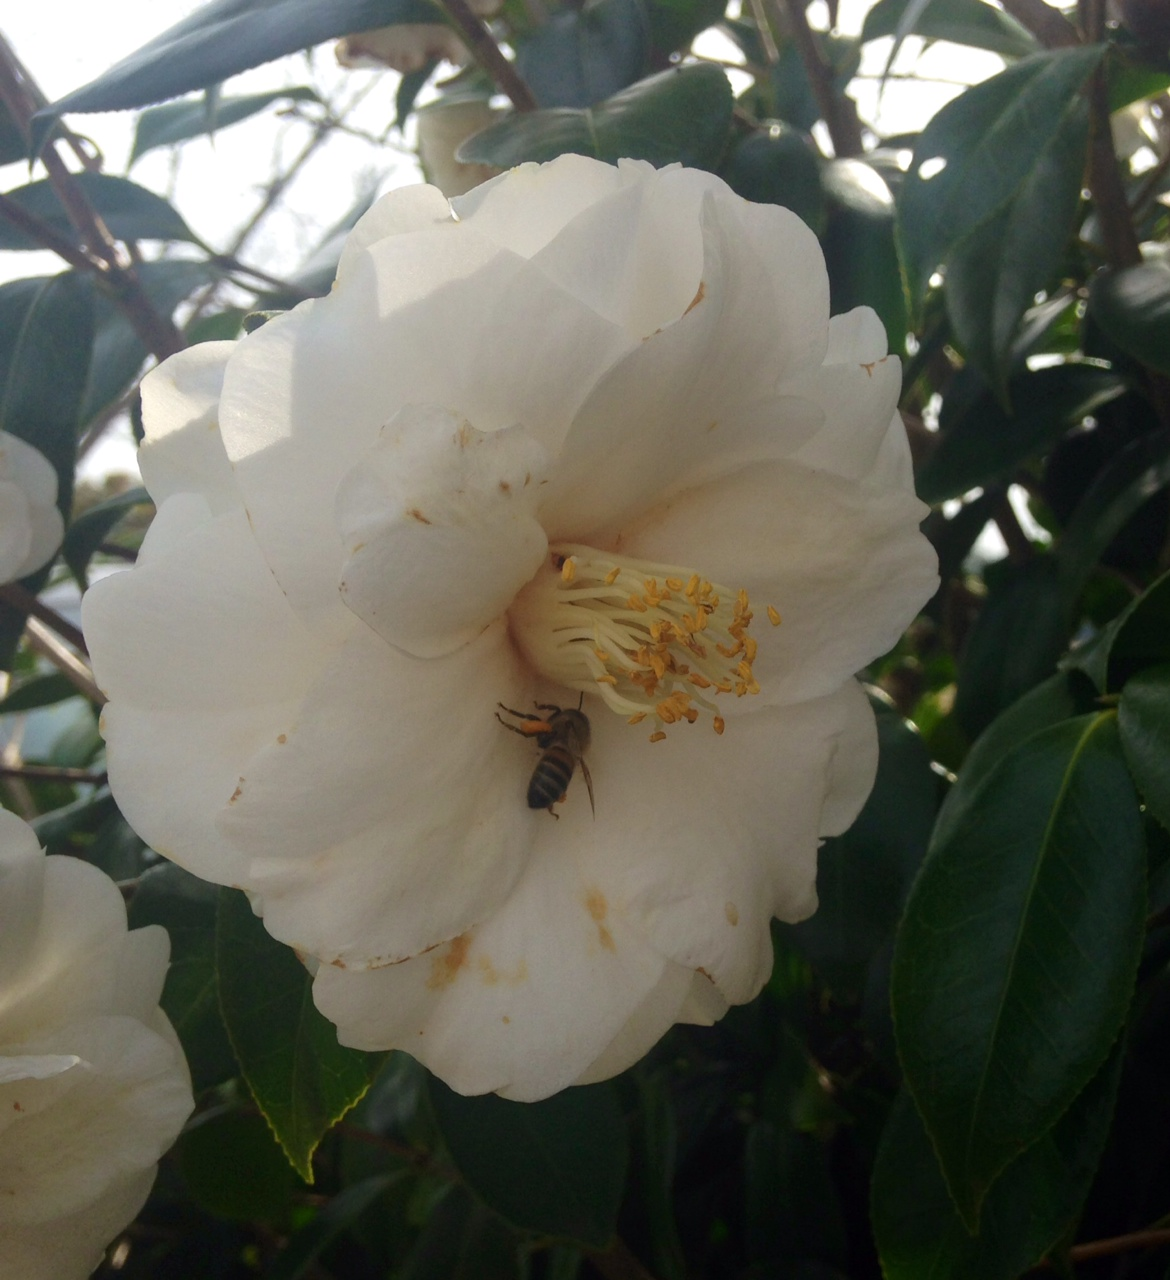 honeybee on Camellia bloom